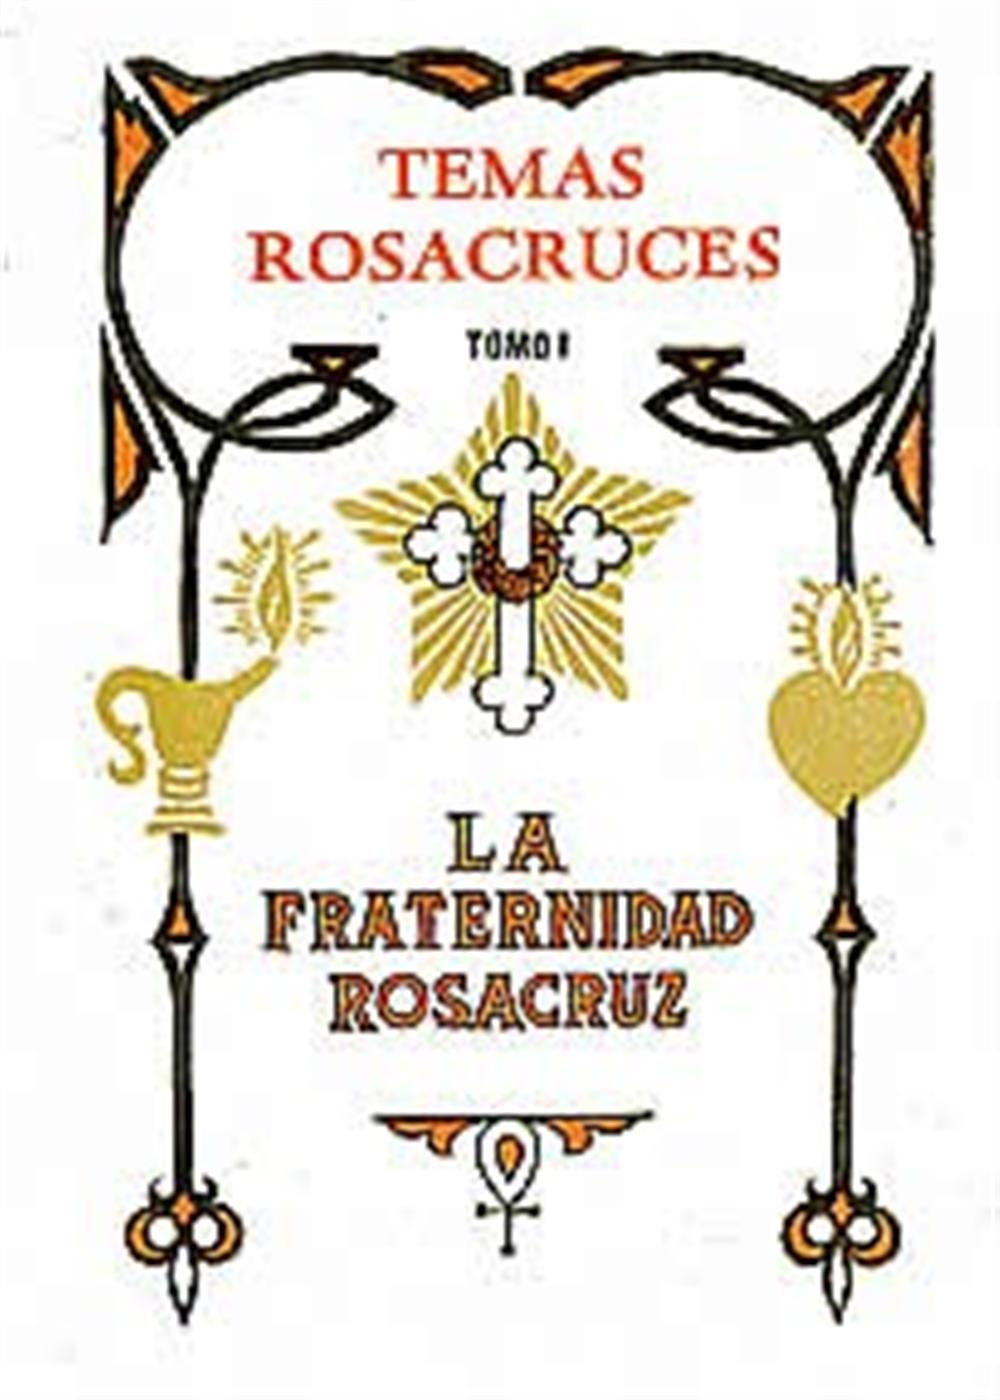 Temas Rosacruces -La fraternidad Rosacruz